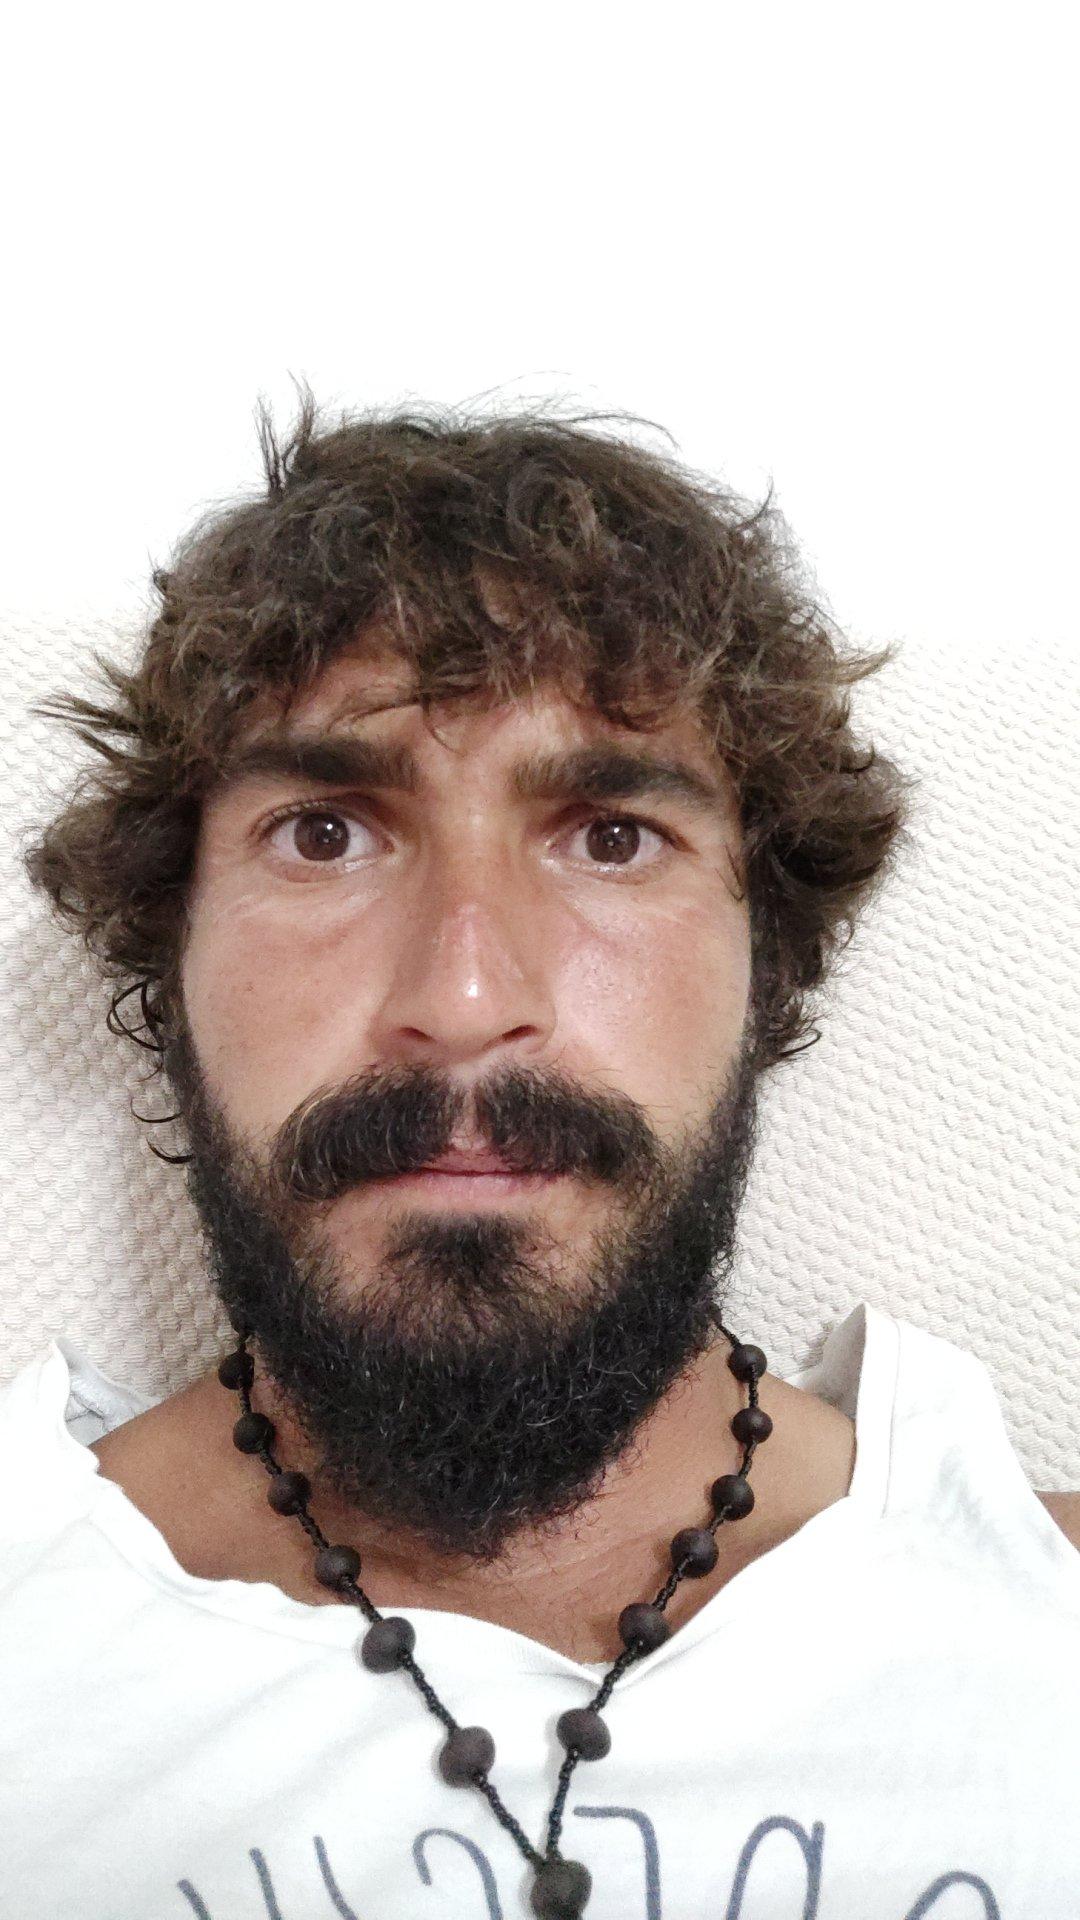 giacomo1990's picture